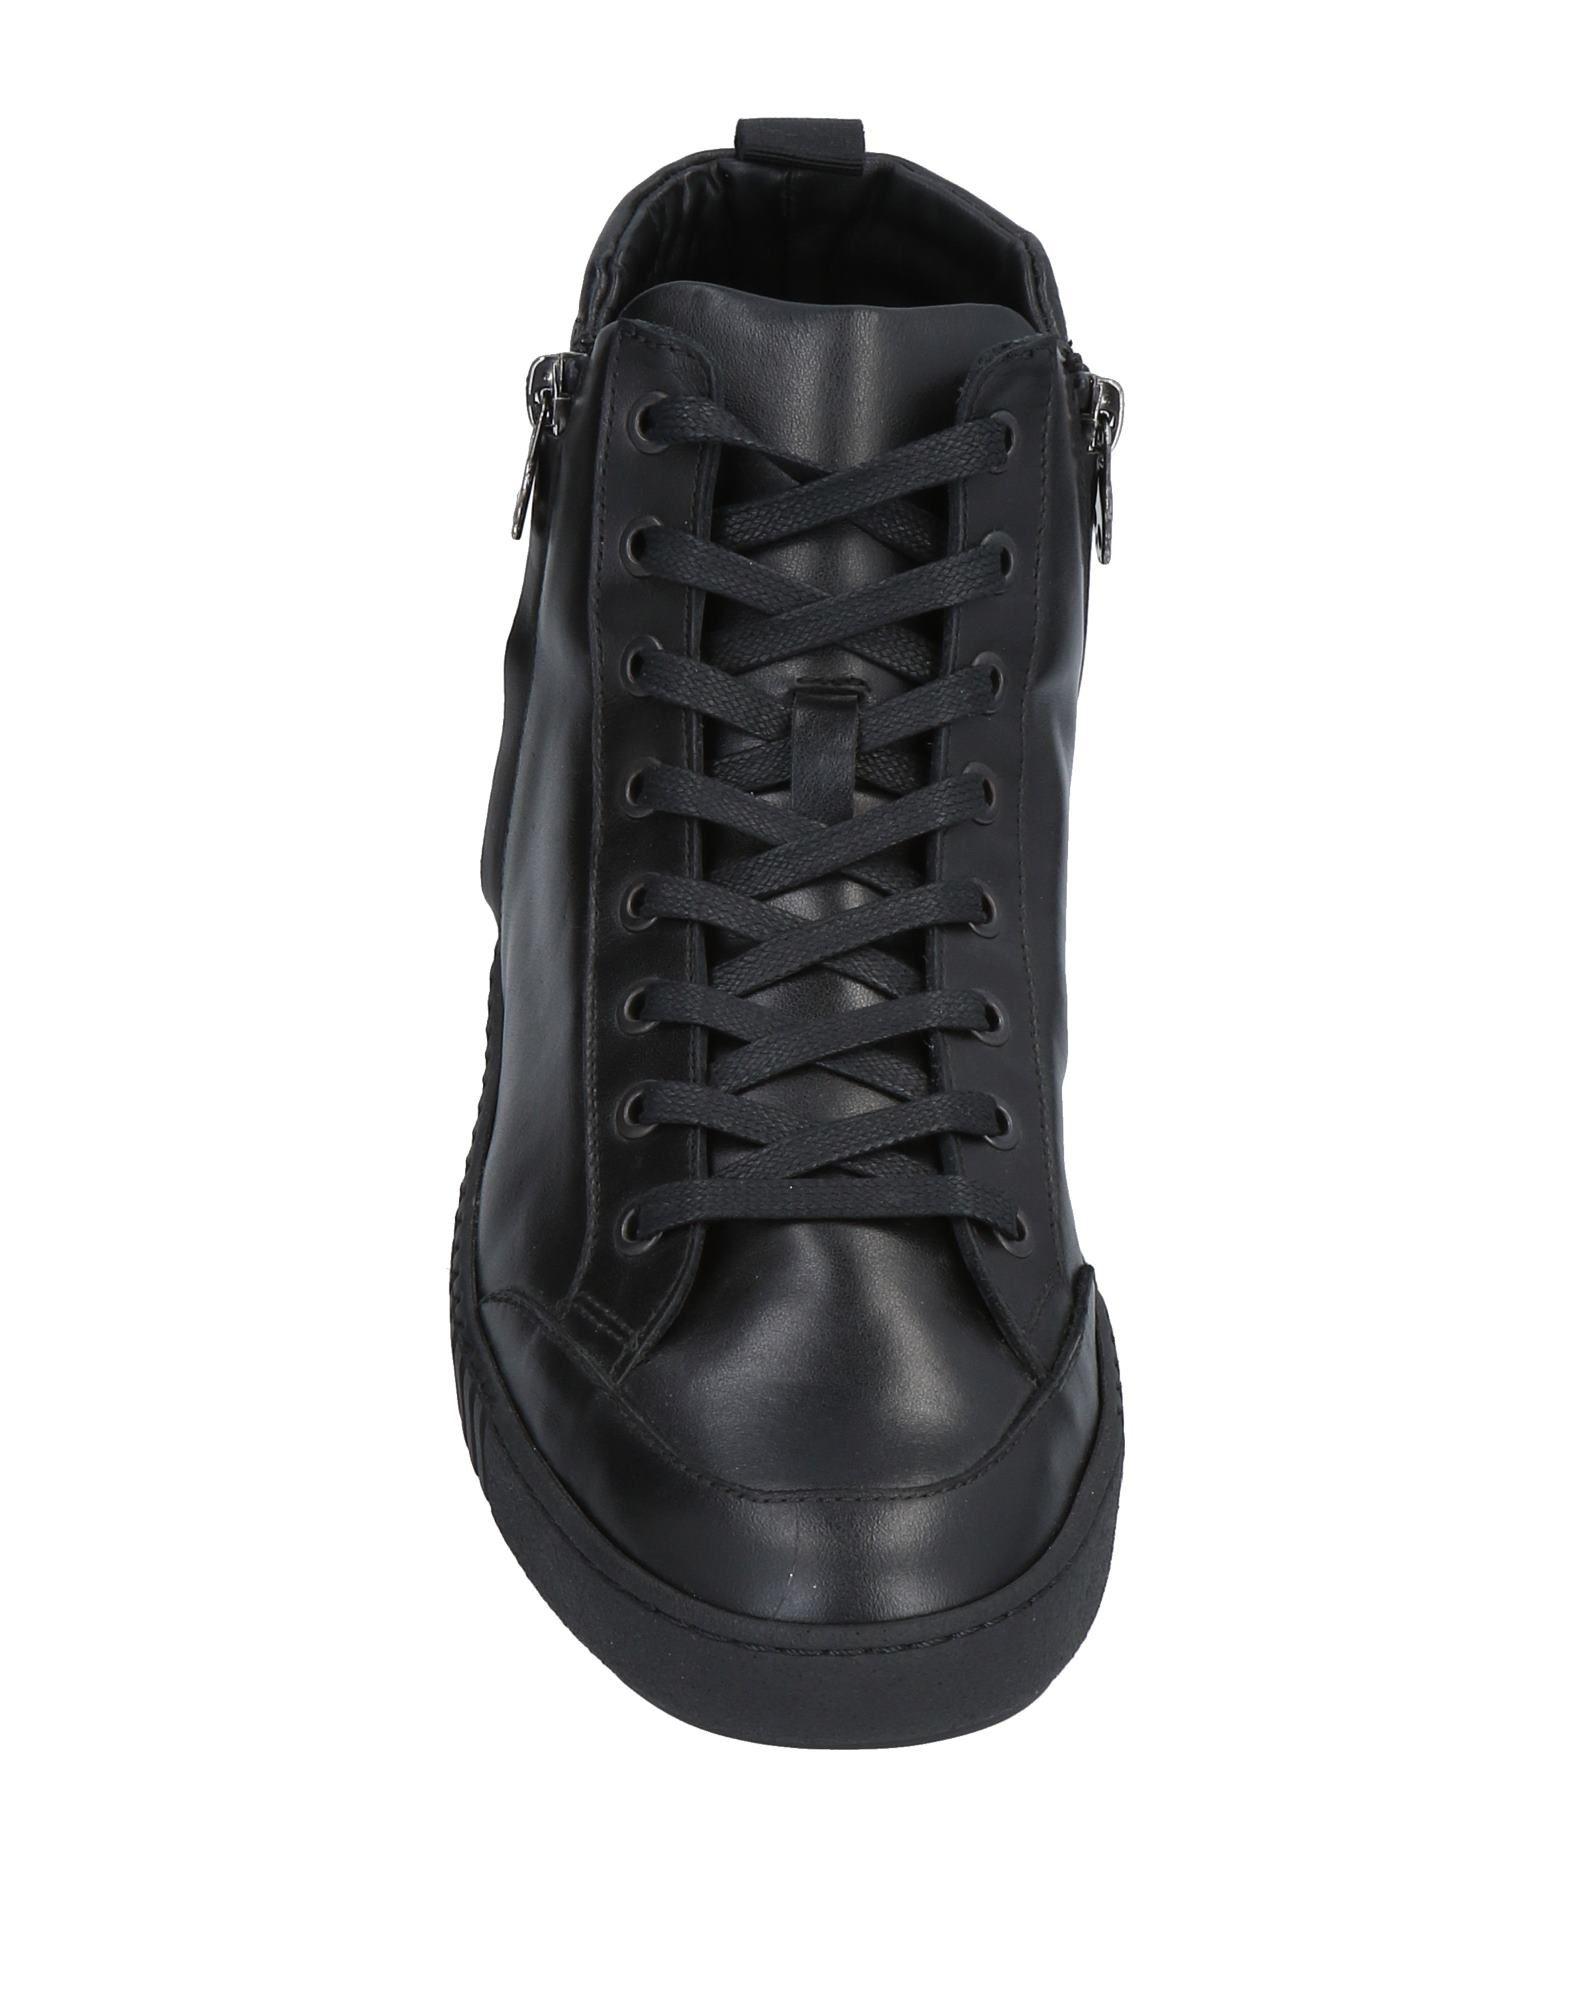 Hydrogen Sneakers Gute Herren  11476167EJ Gute Sneakers Qualität beliebte Schuhe f677d8